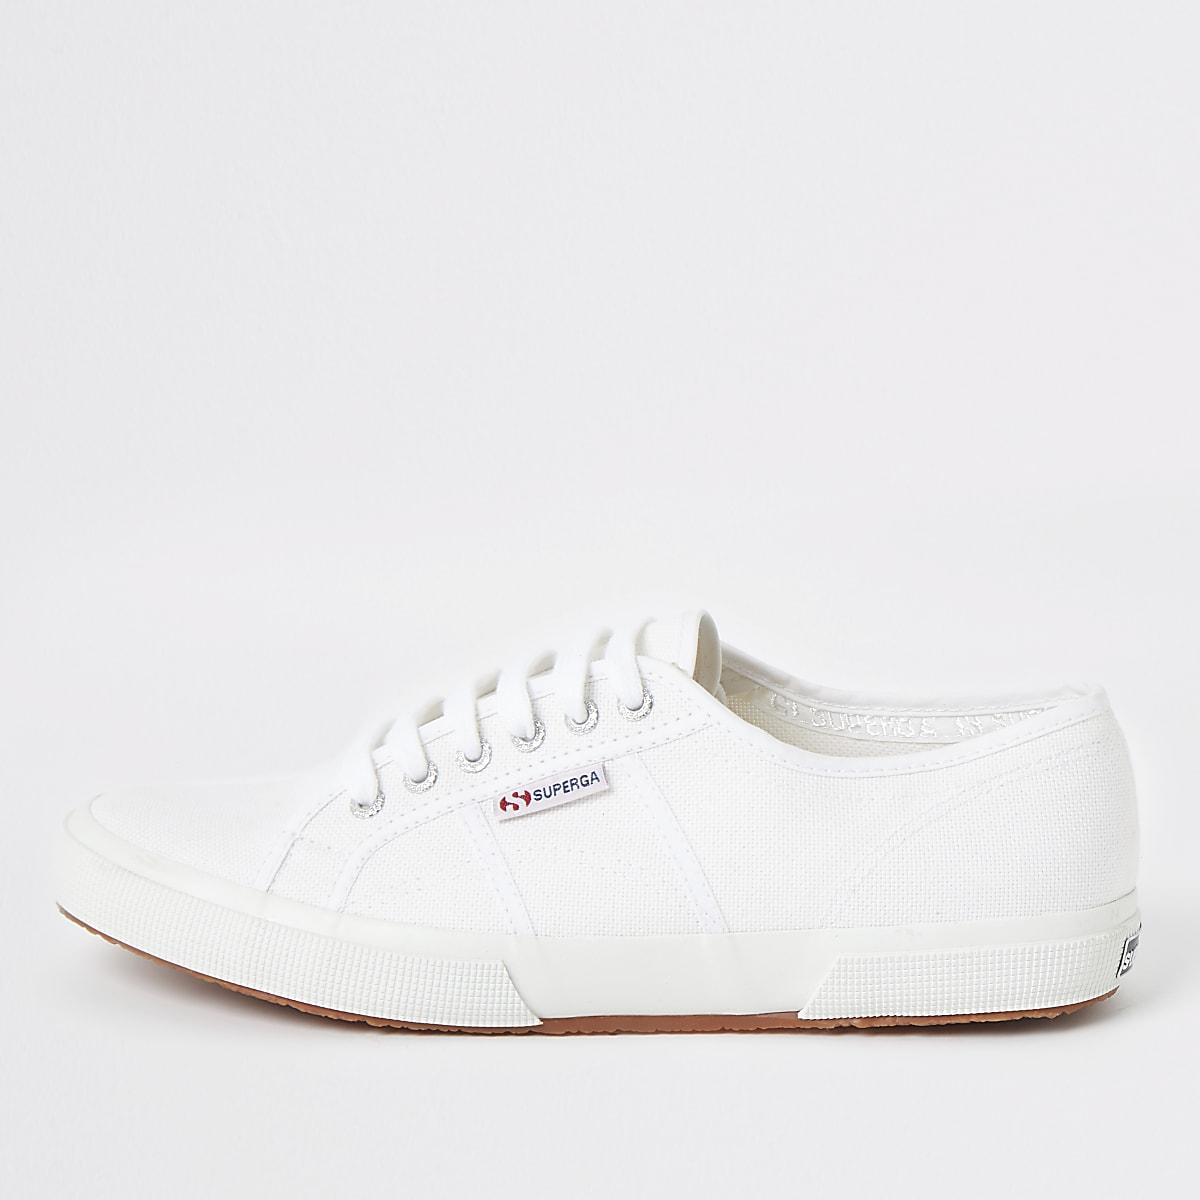 Superga white classic runner sneakers